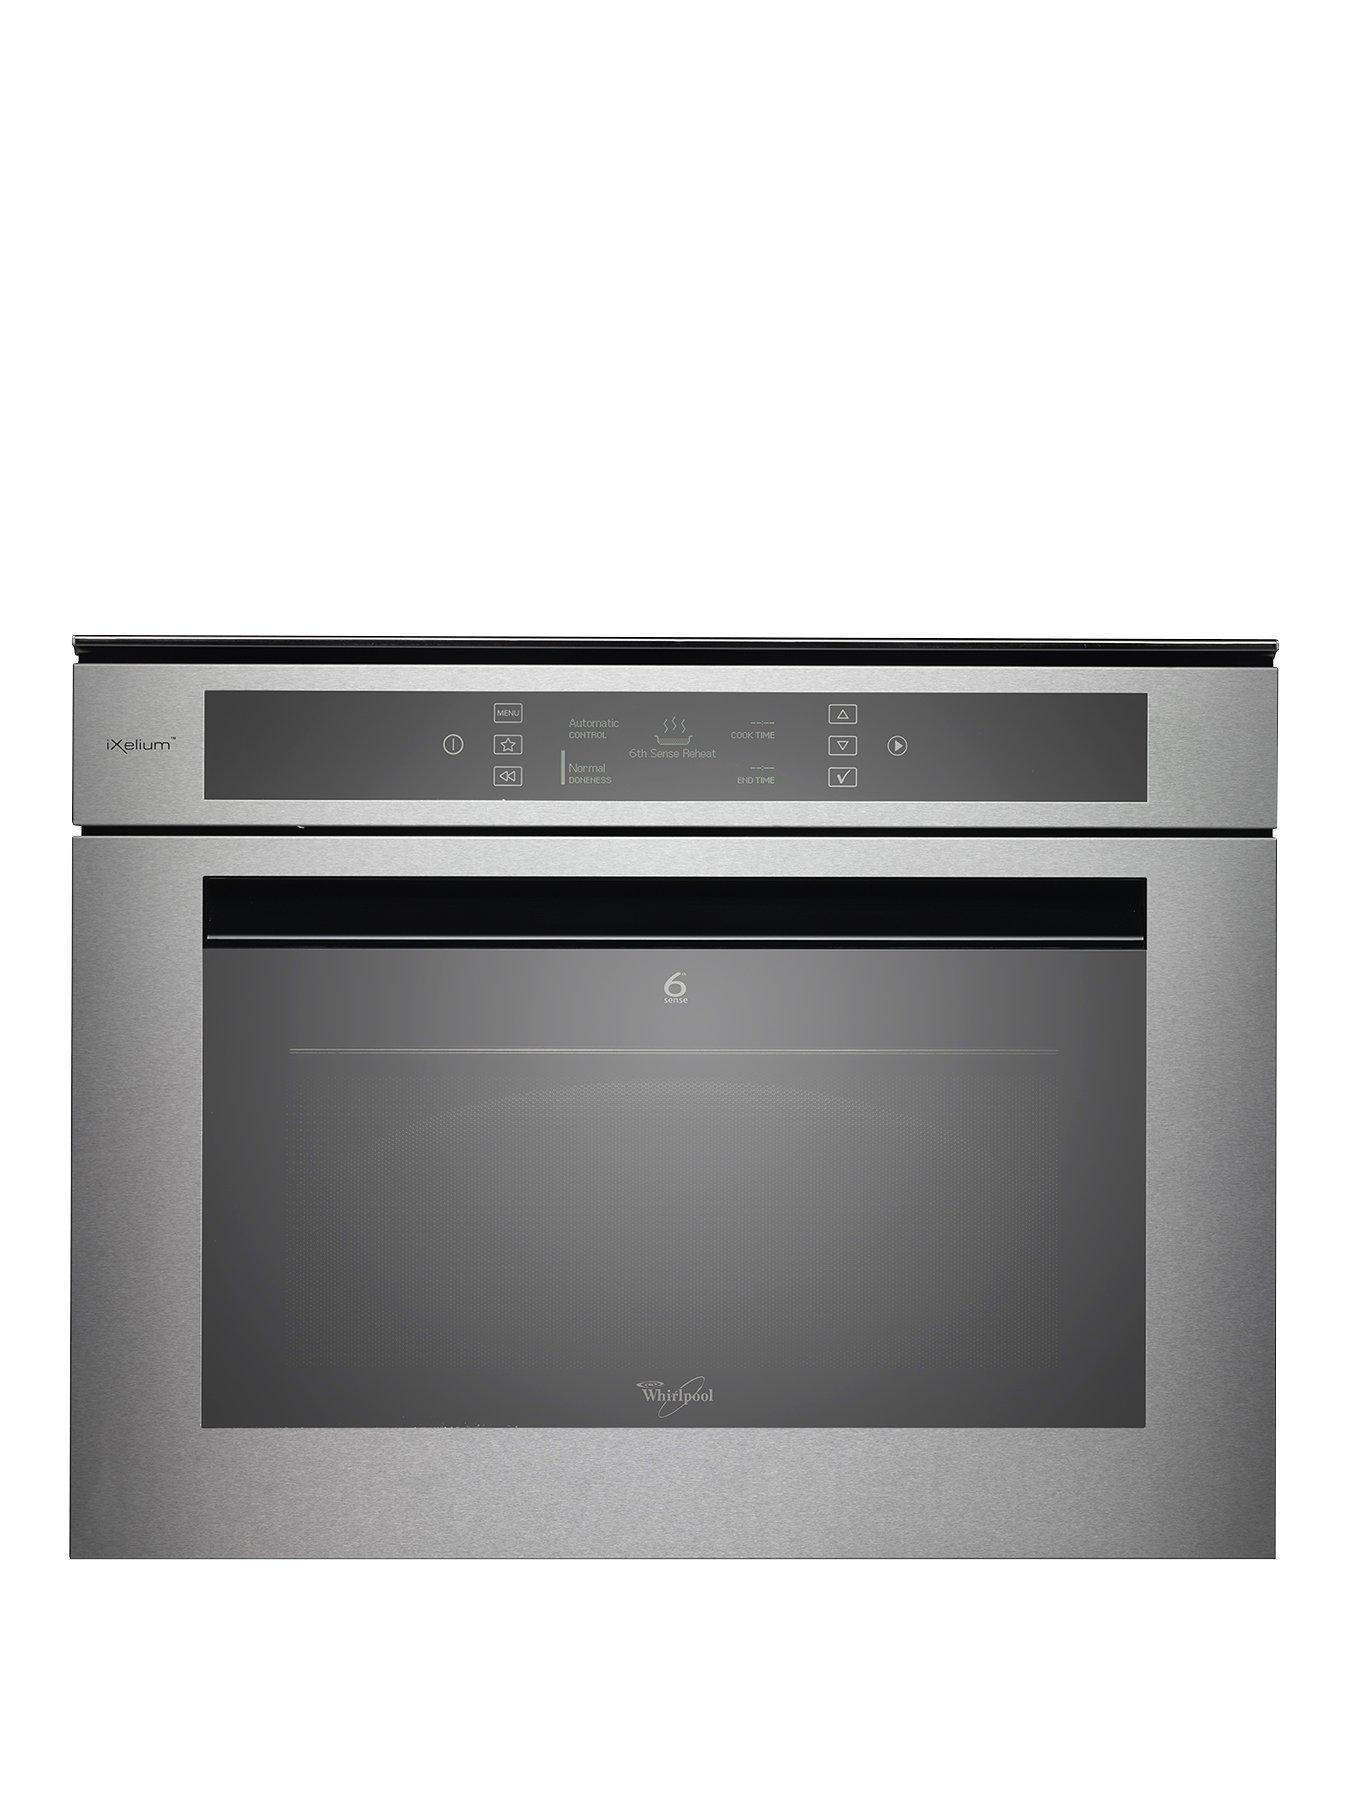 Whirlpool AMW850IXL Microwave